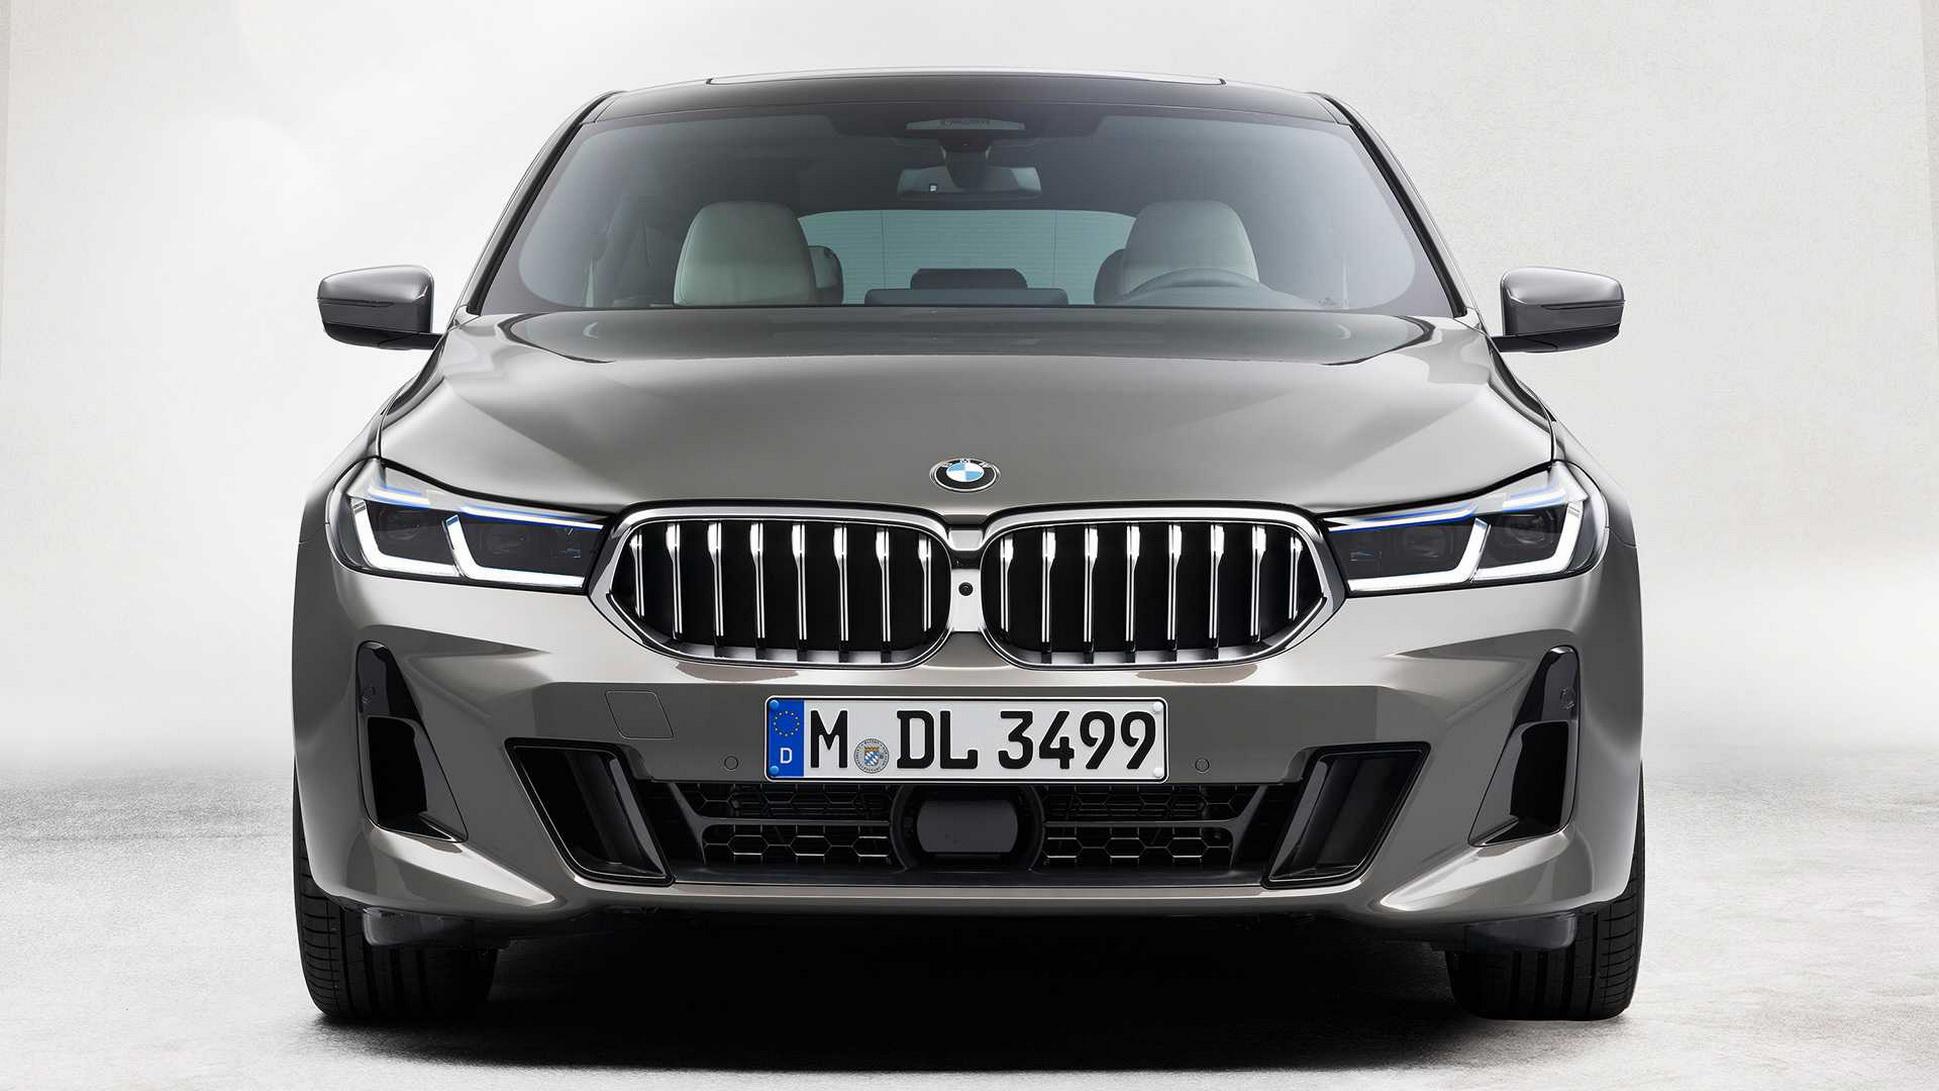 2021-bmw-6-series-gt-facelift-10.jpg